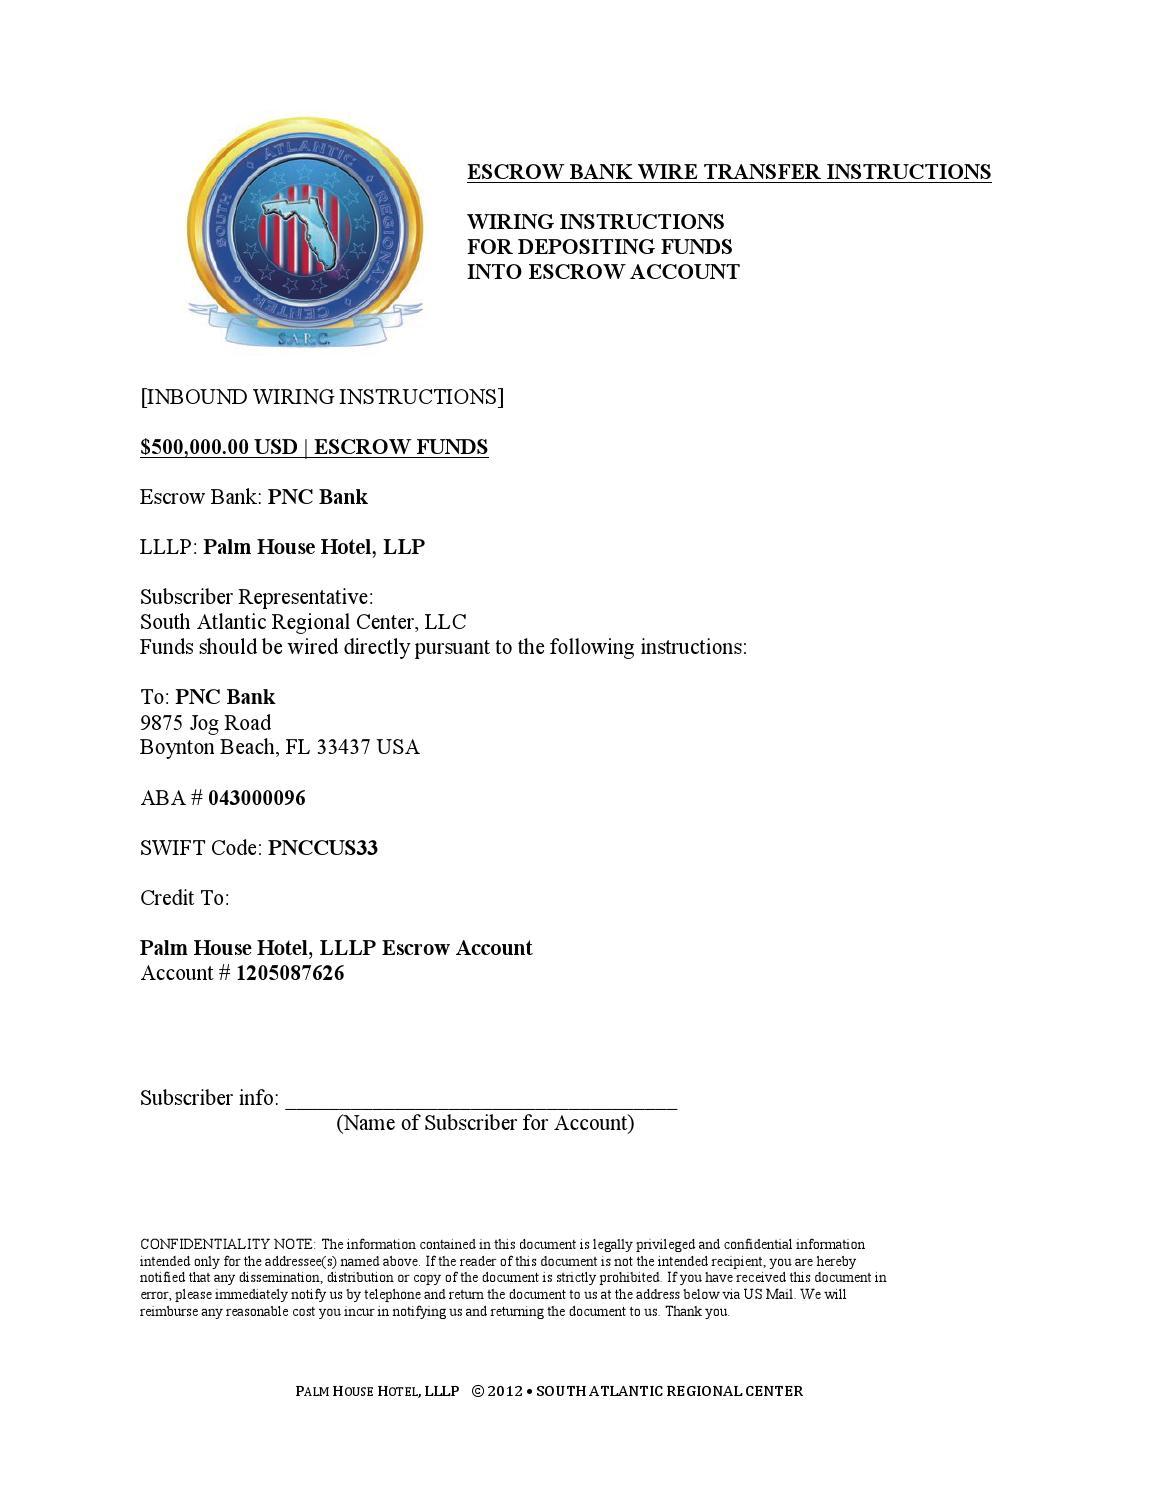 palm house investment portfolio by become american investor issuu rh issuu com